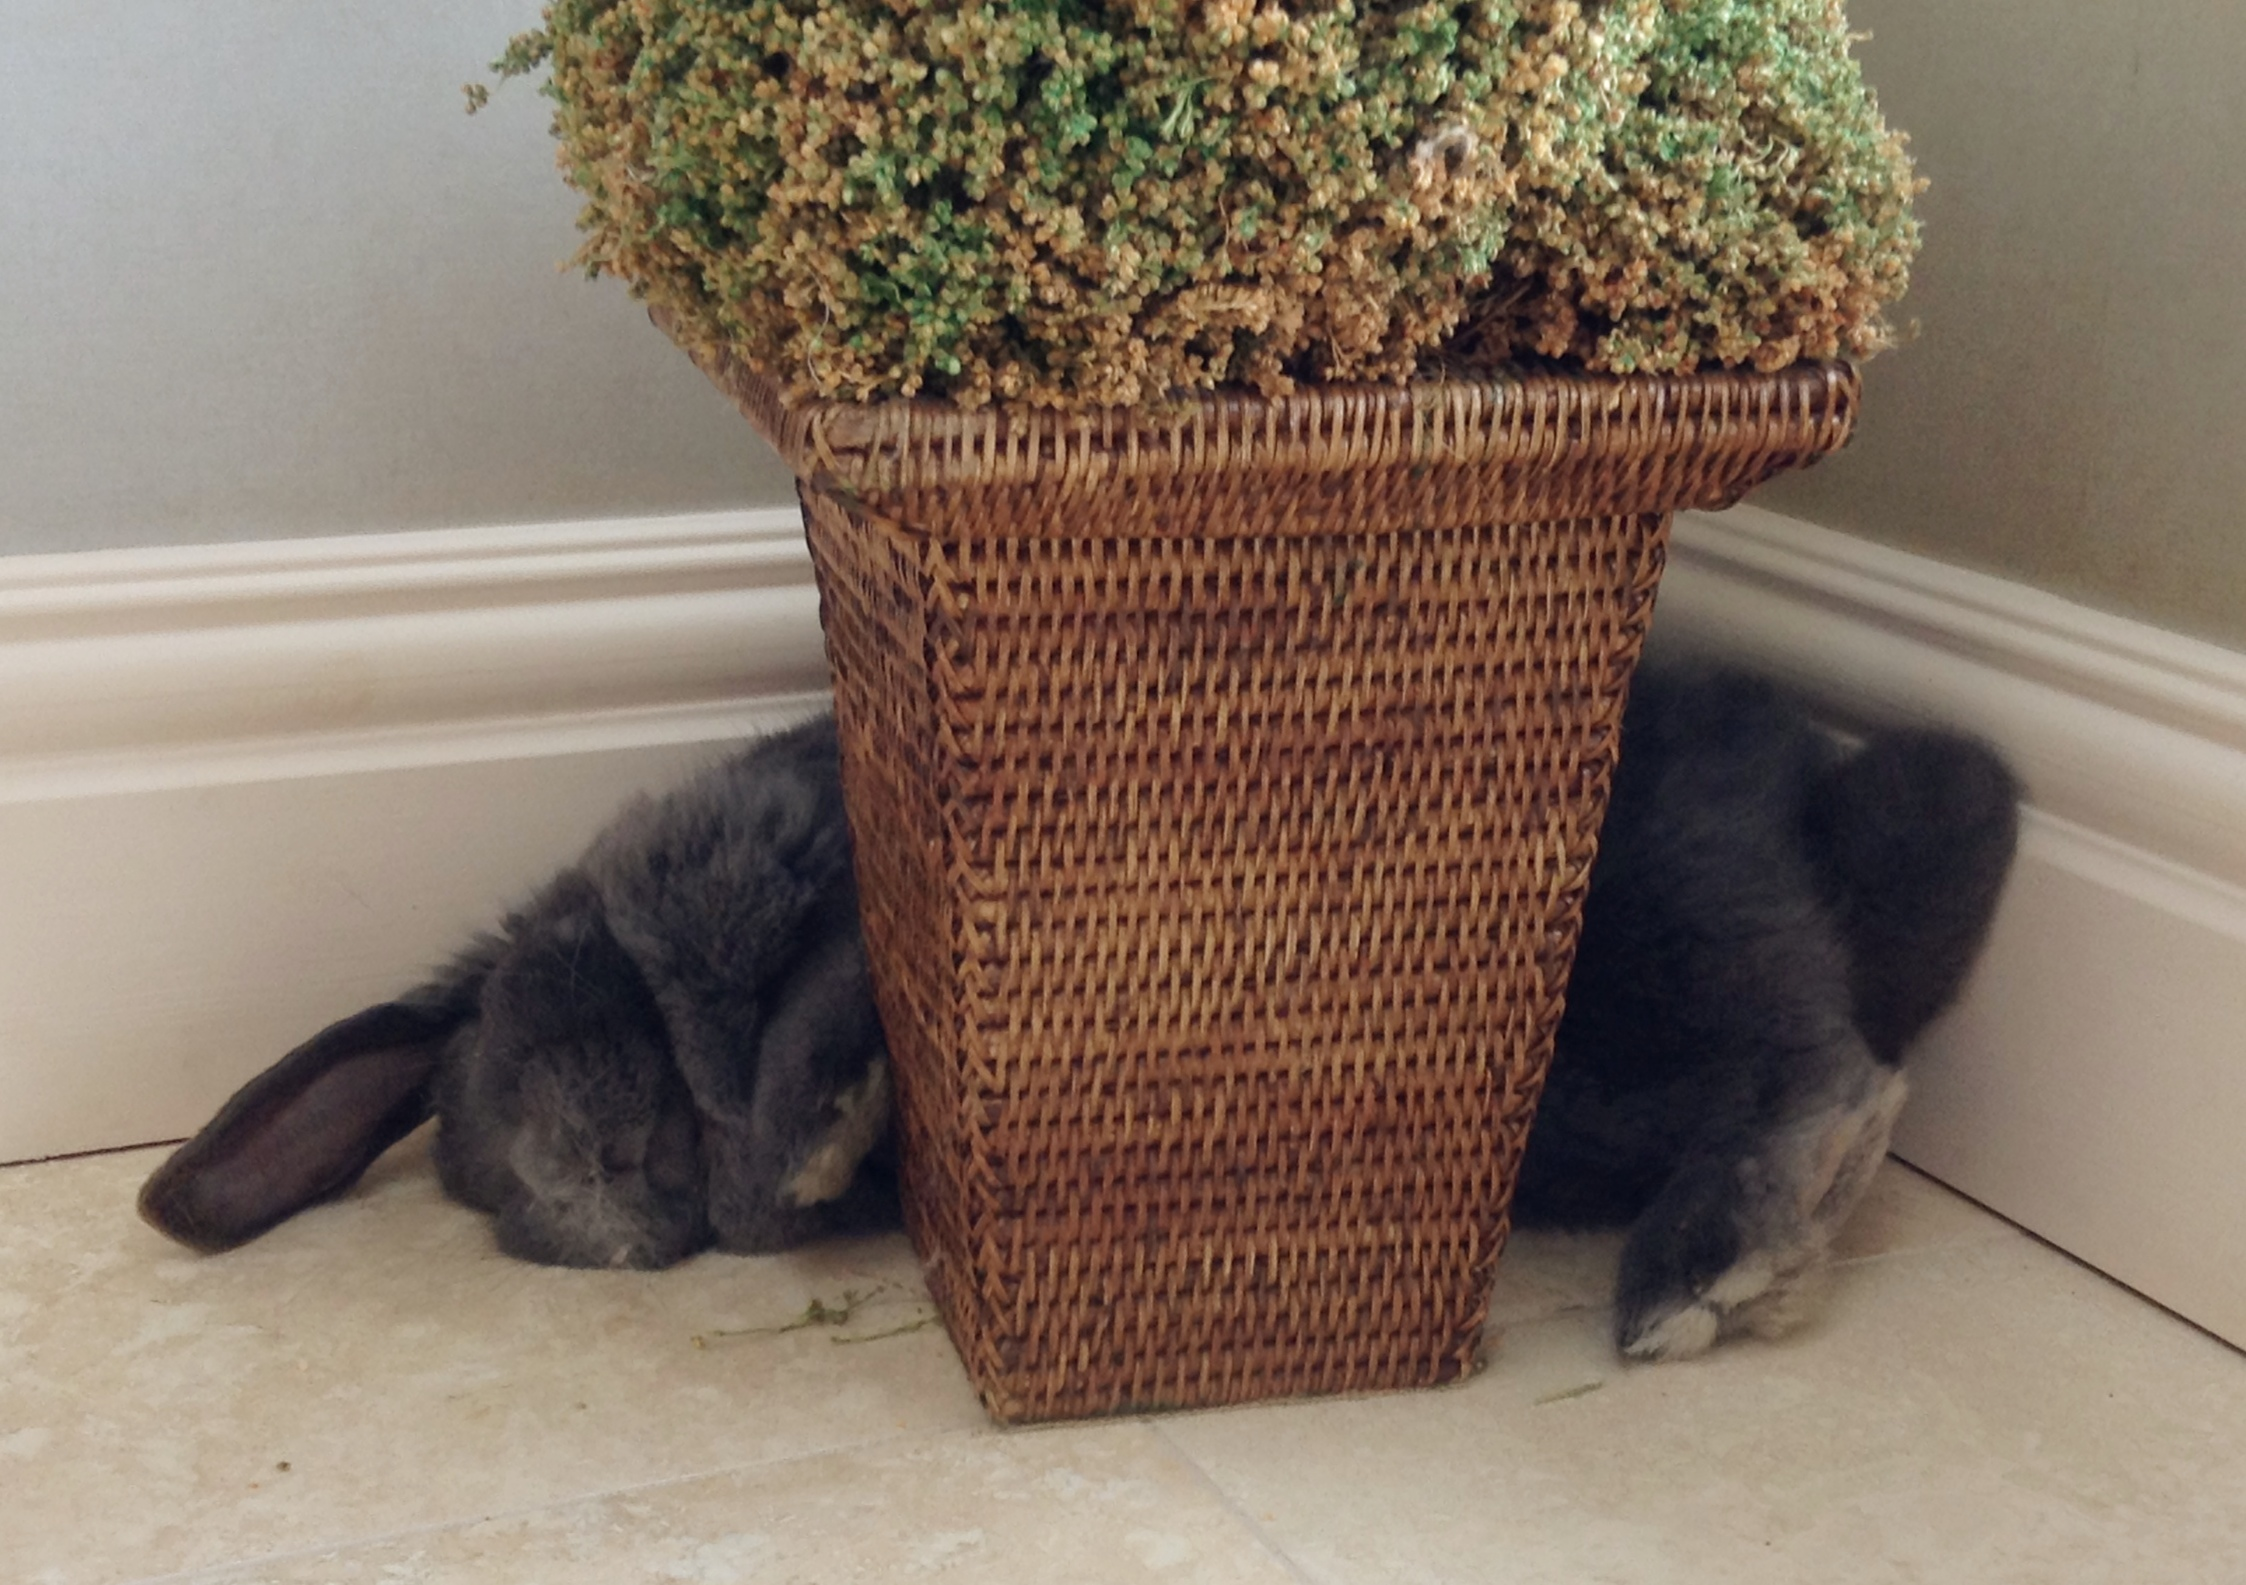 Bunny Sleeps Hugging the House Plant